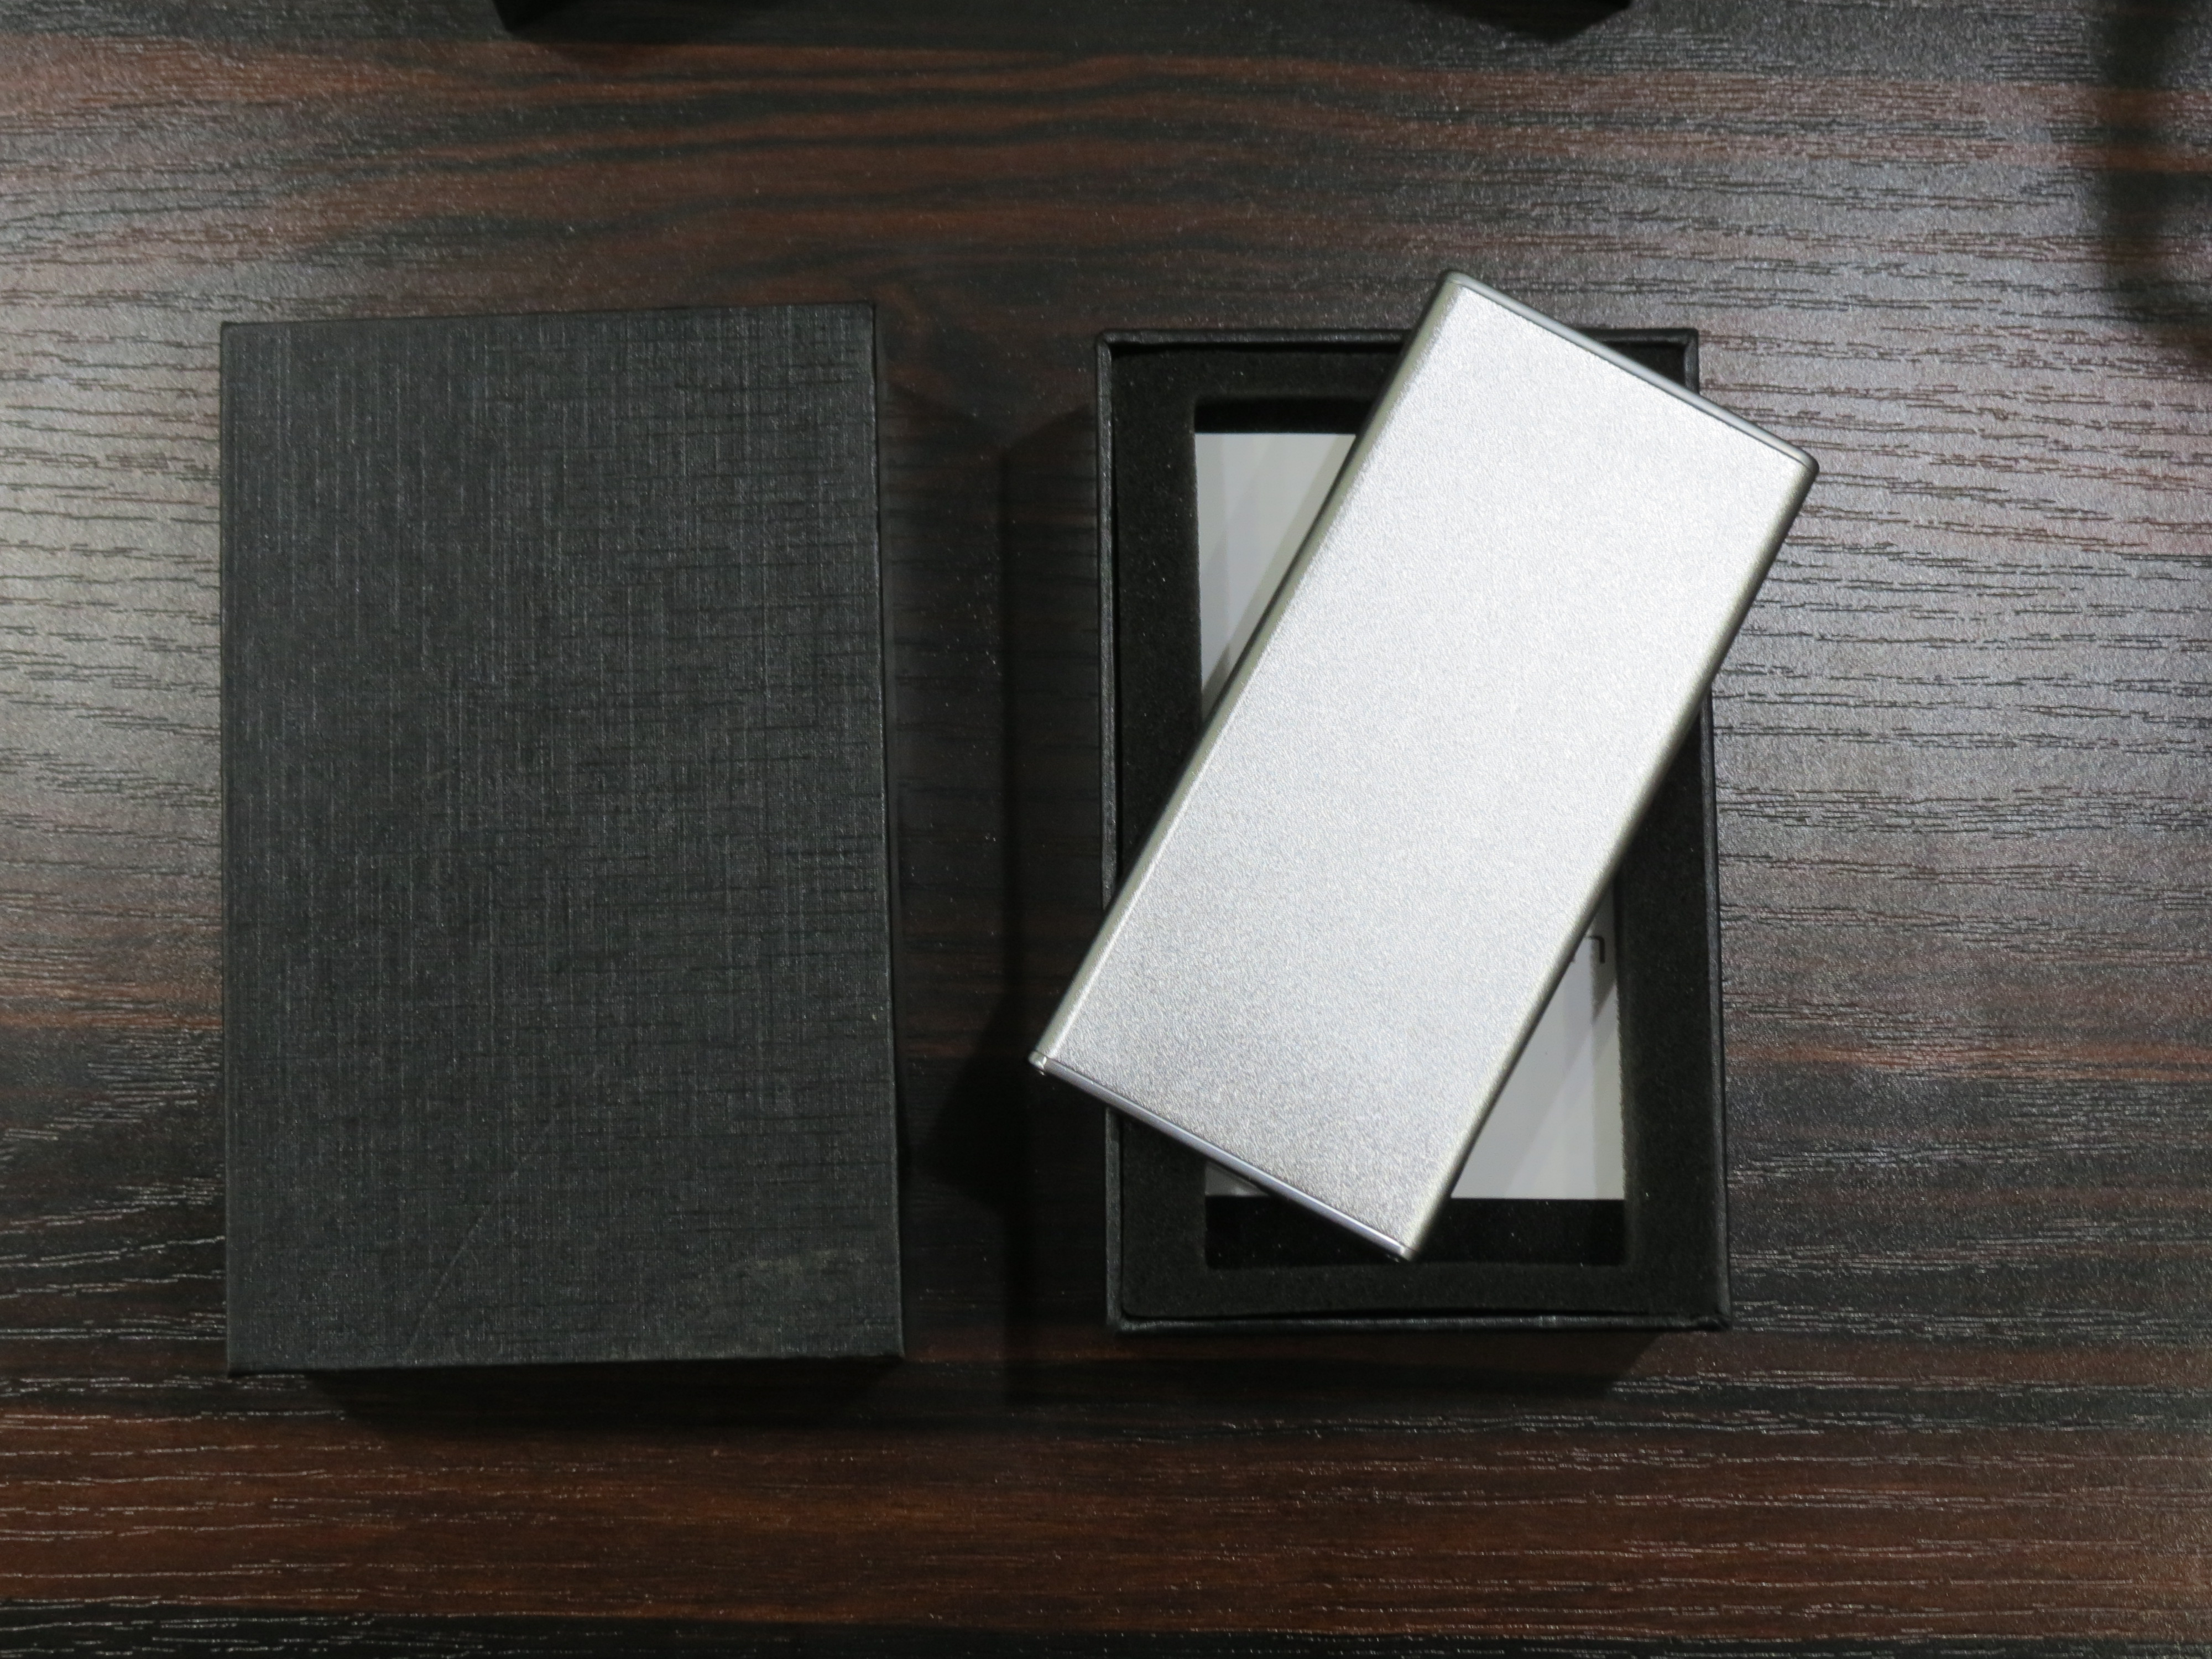 Sleek Silver Power Bank